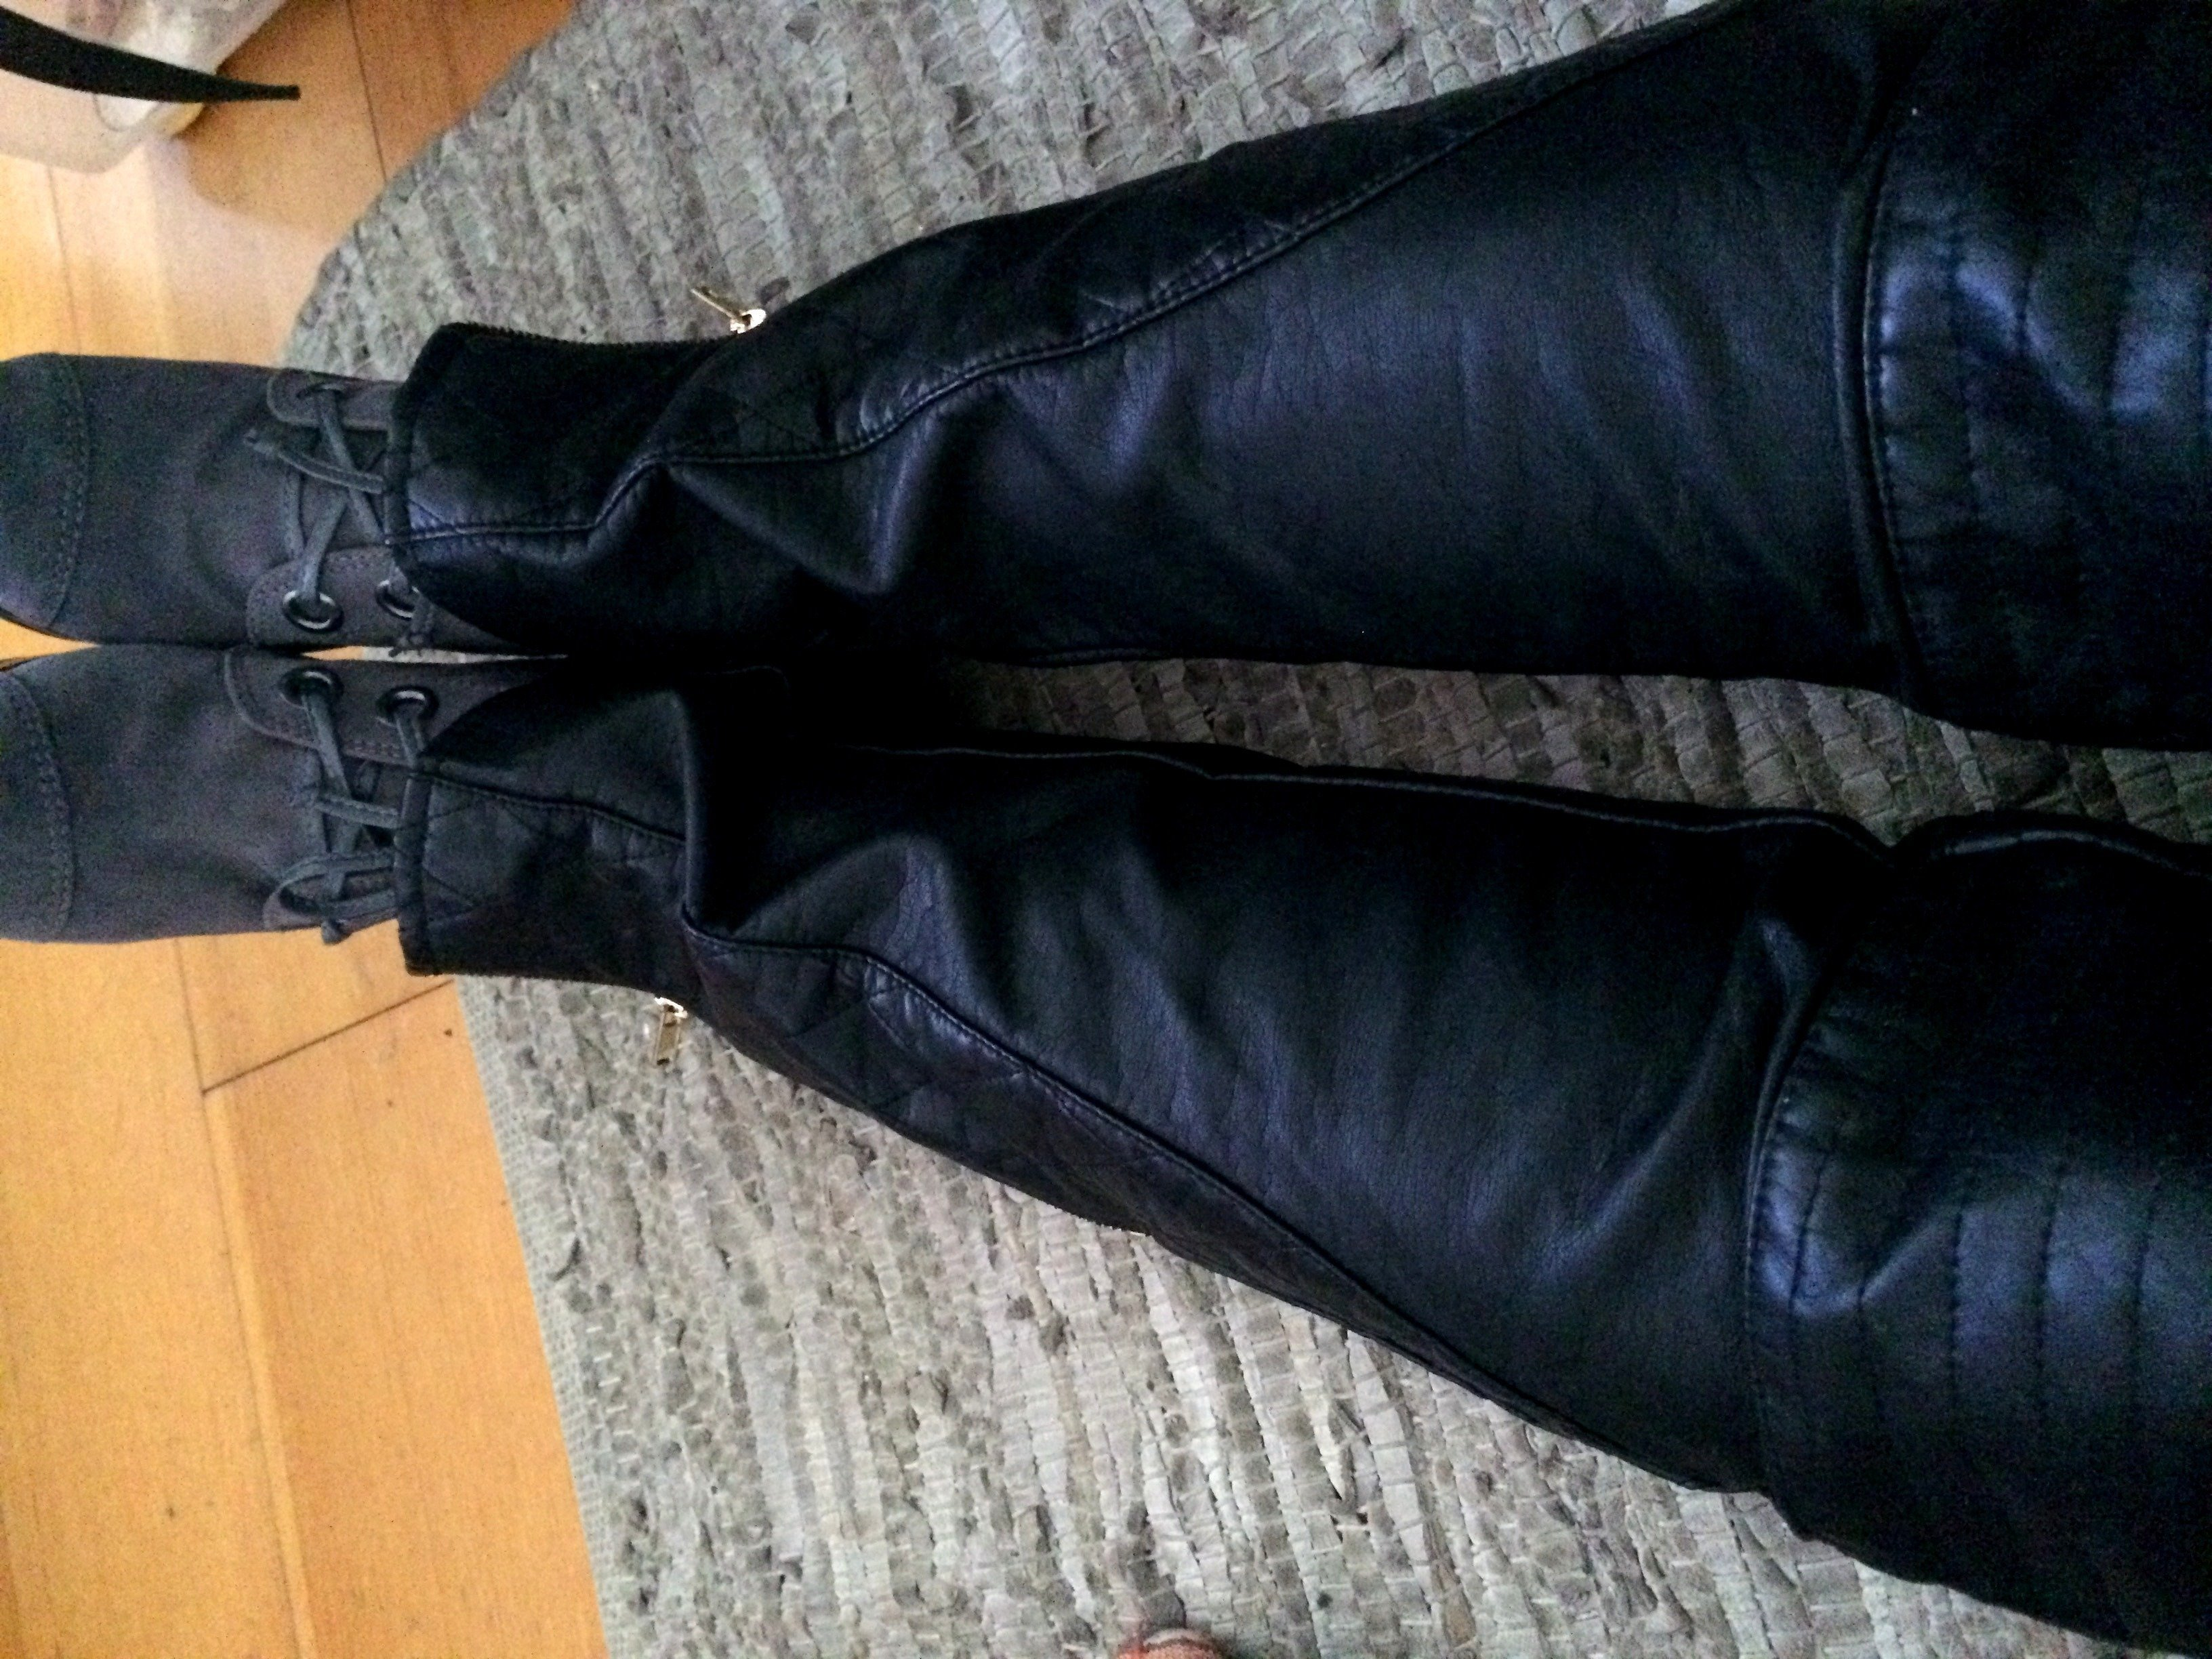 detalhe-calca-couro-preta-boot-arezzo-cris-cardoso